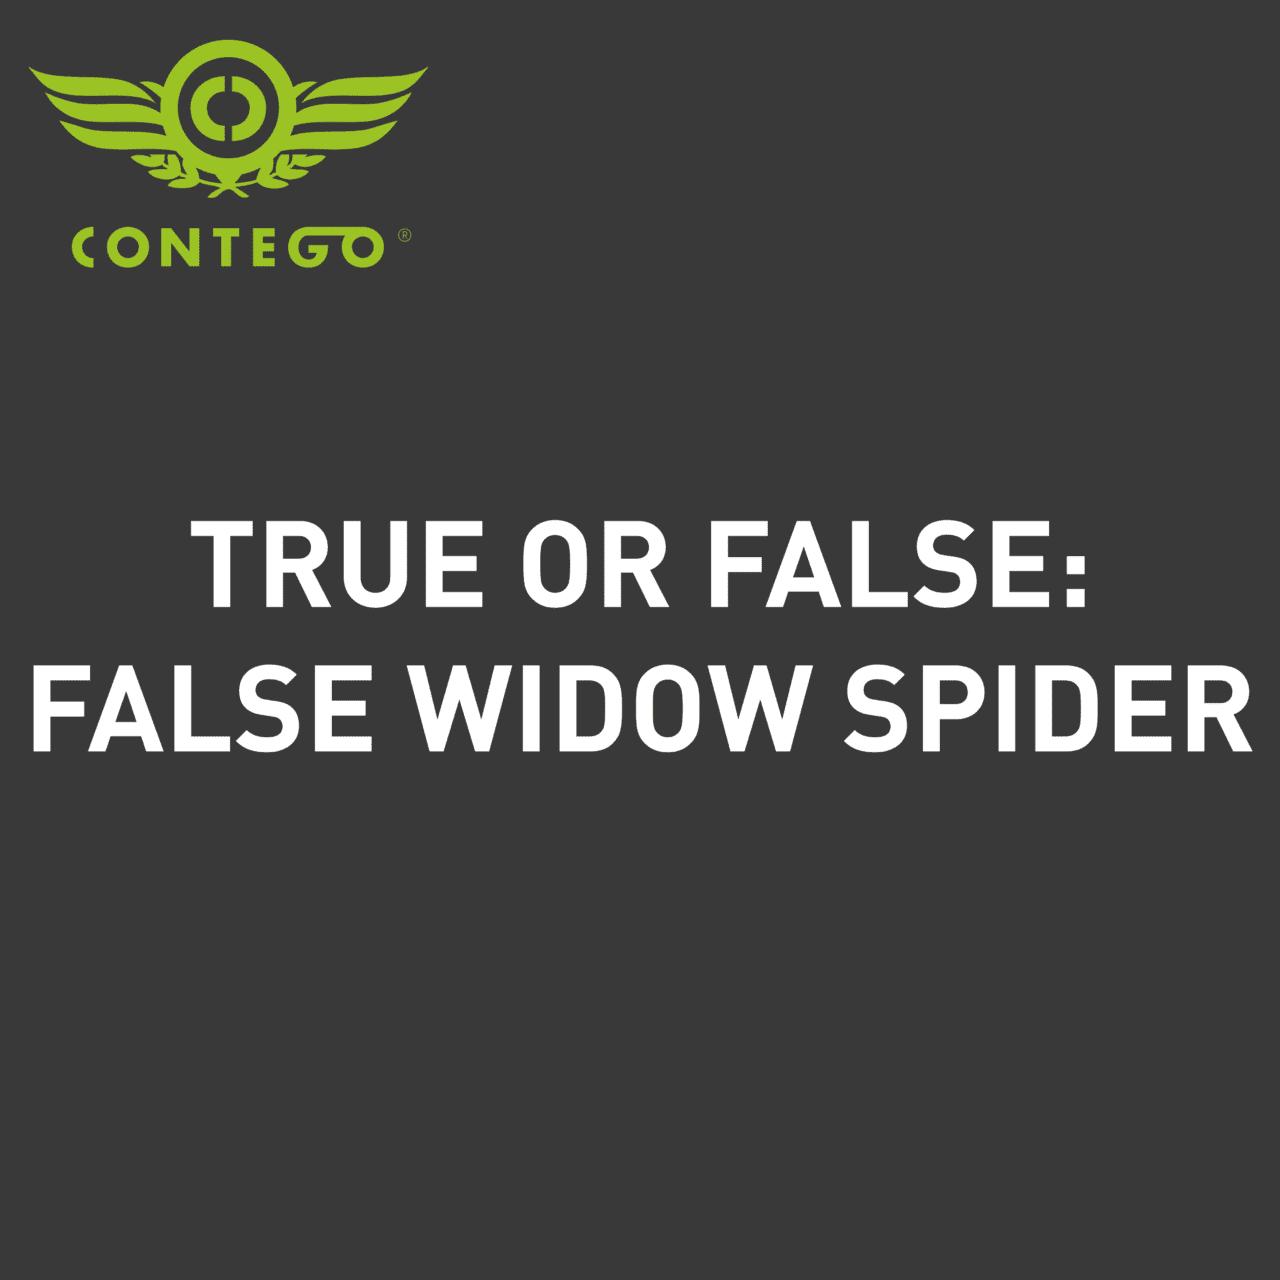 TRUE OR FALSE WIDOWN SPIDER